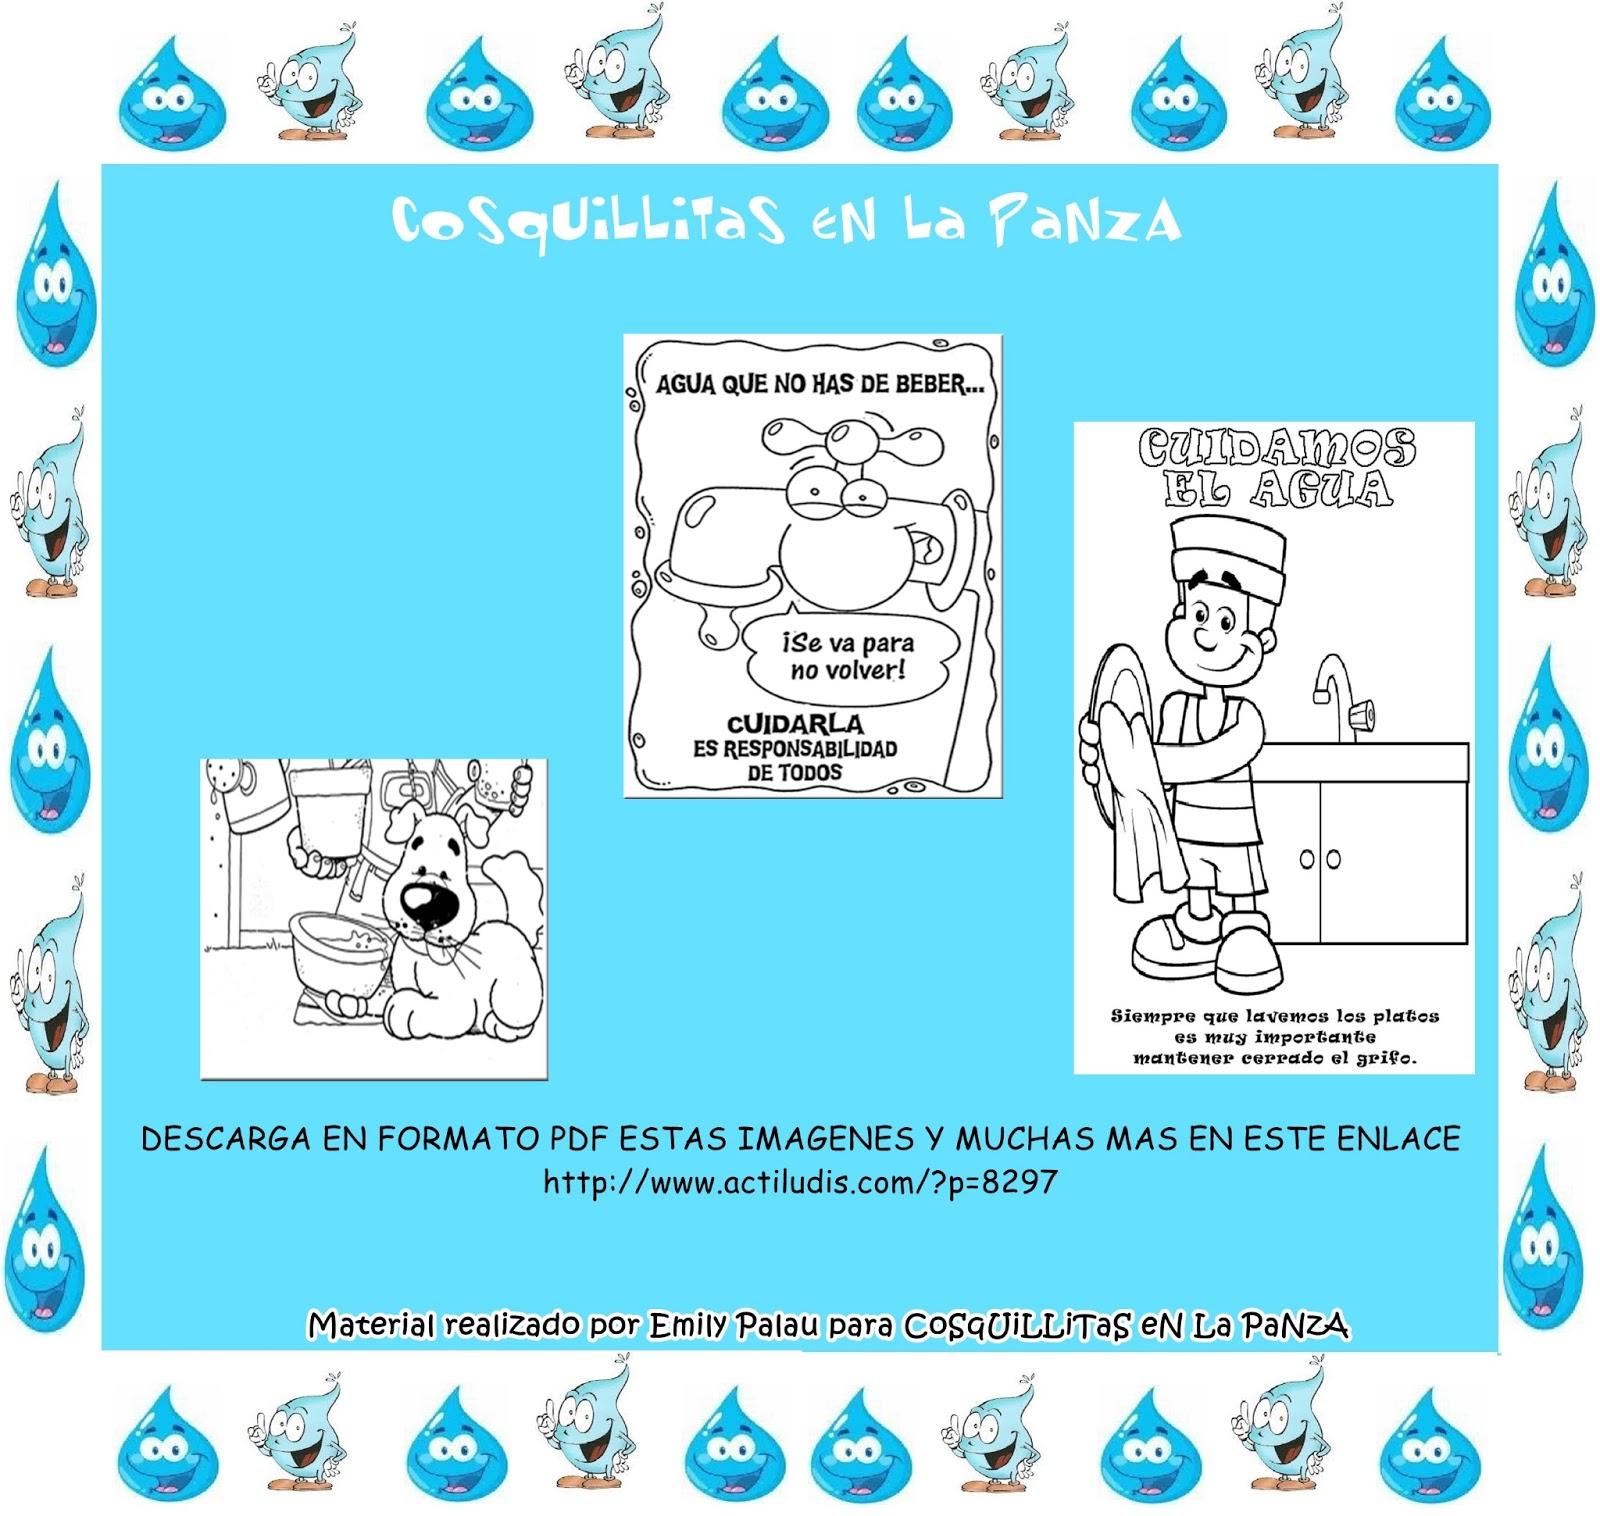 APOYO ESCOLAR ING MASCHWITZT CONTACTO TELEF 011-15-37910372: EL AGUA ...